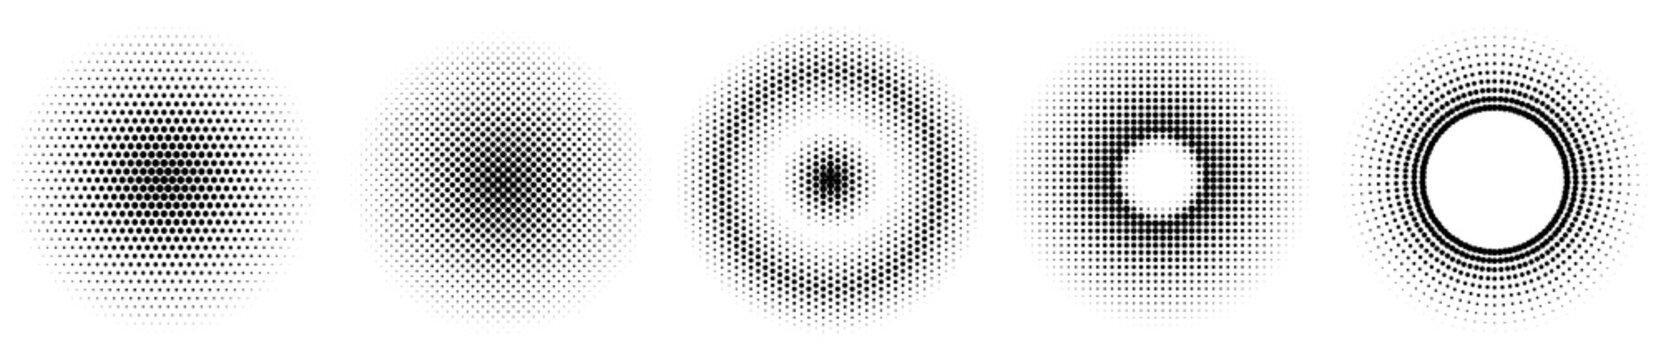 Set of simple halftones. Black gradient circles of dots. Dotwork. Vector illustration.